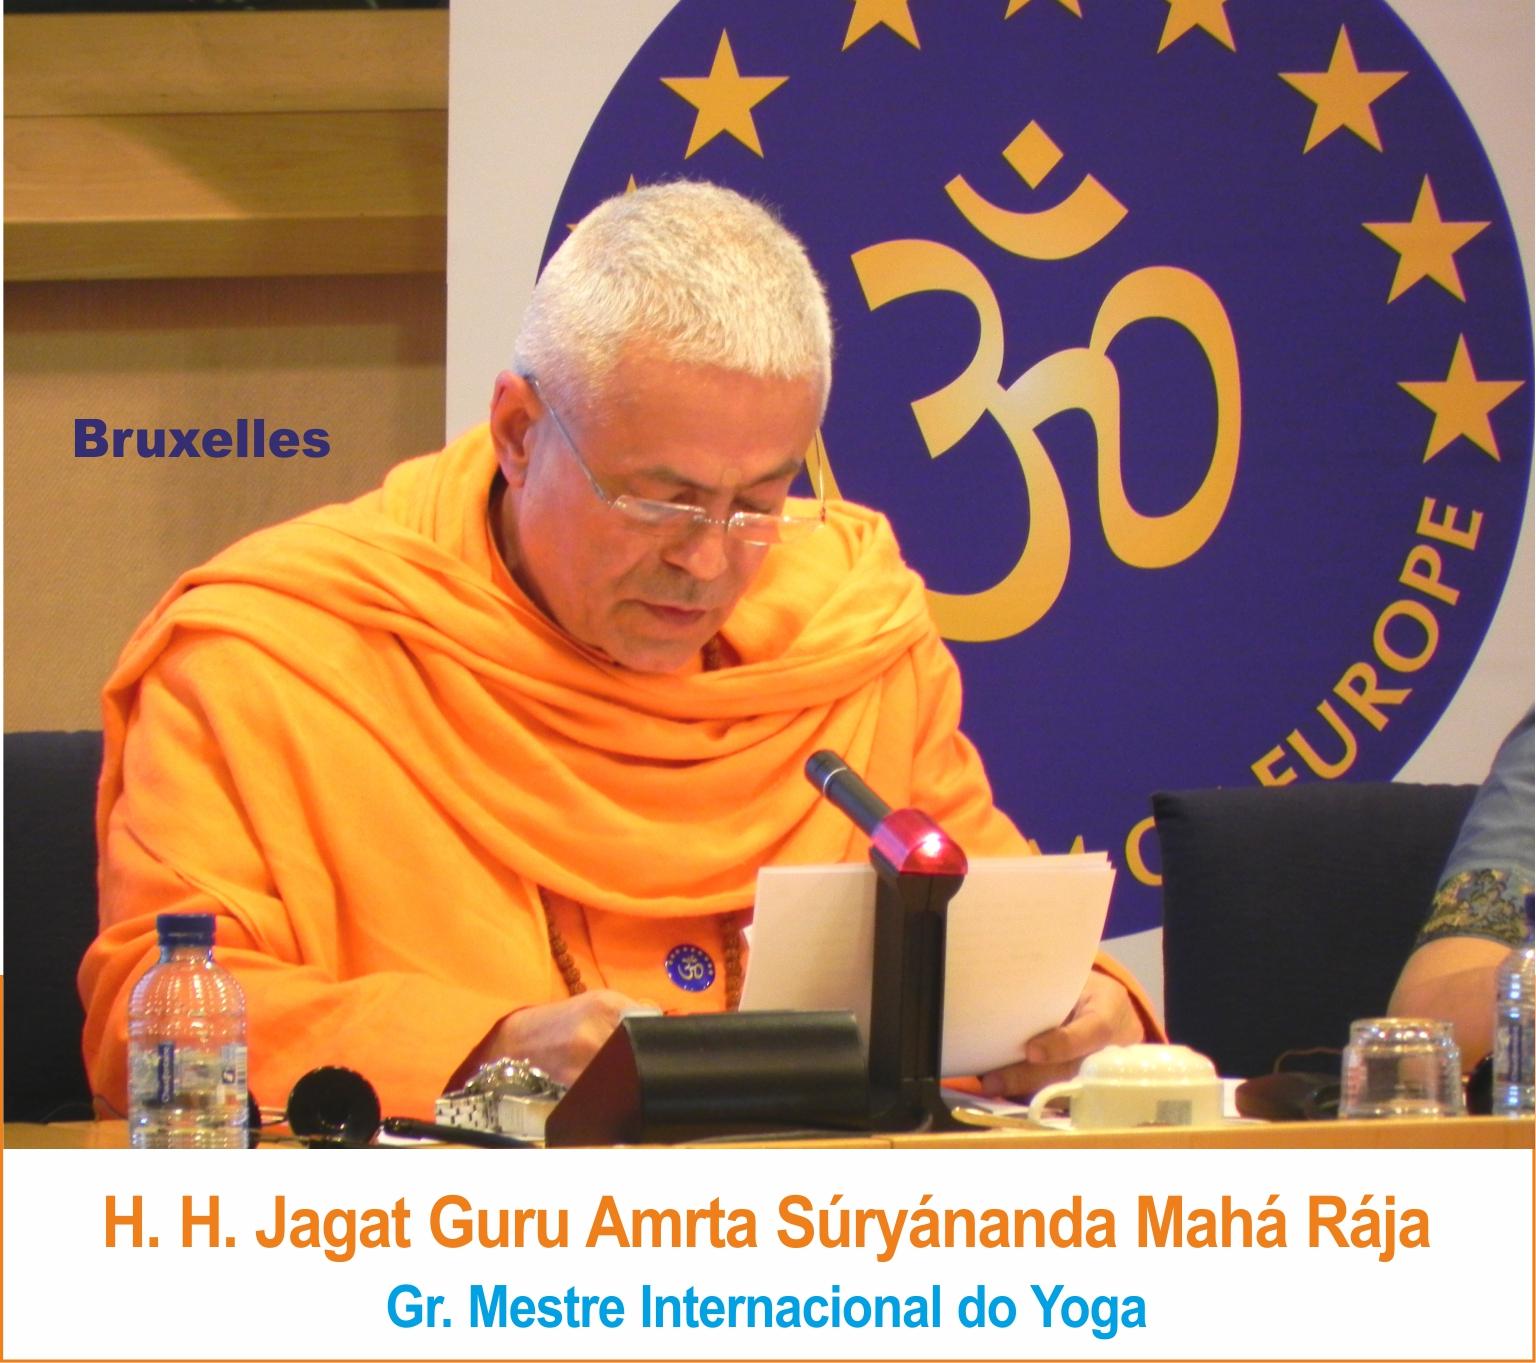 Yoga Guru Amrta Súryánanda Mahá Rája